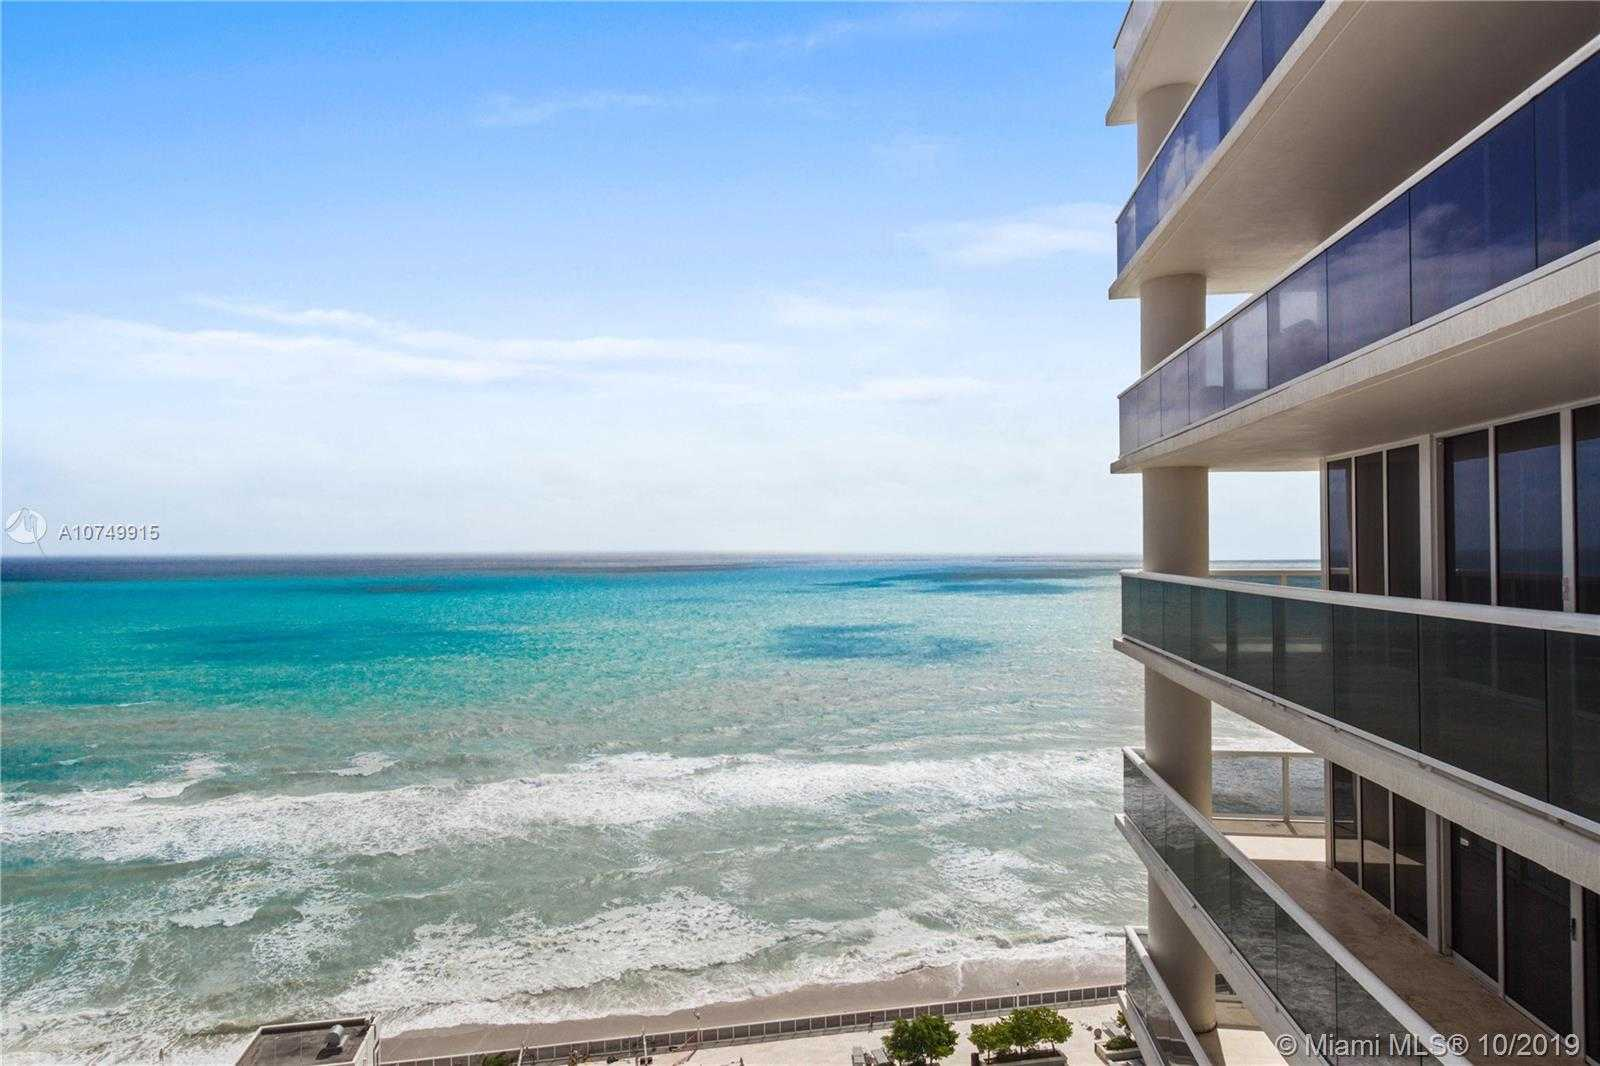 $730,000 - 2Br/2Ba -  for Sale in Beach Club Condo 1, Hallandale